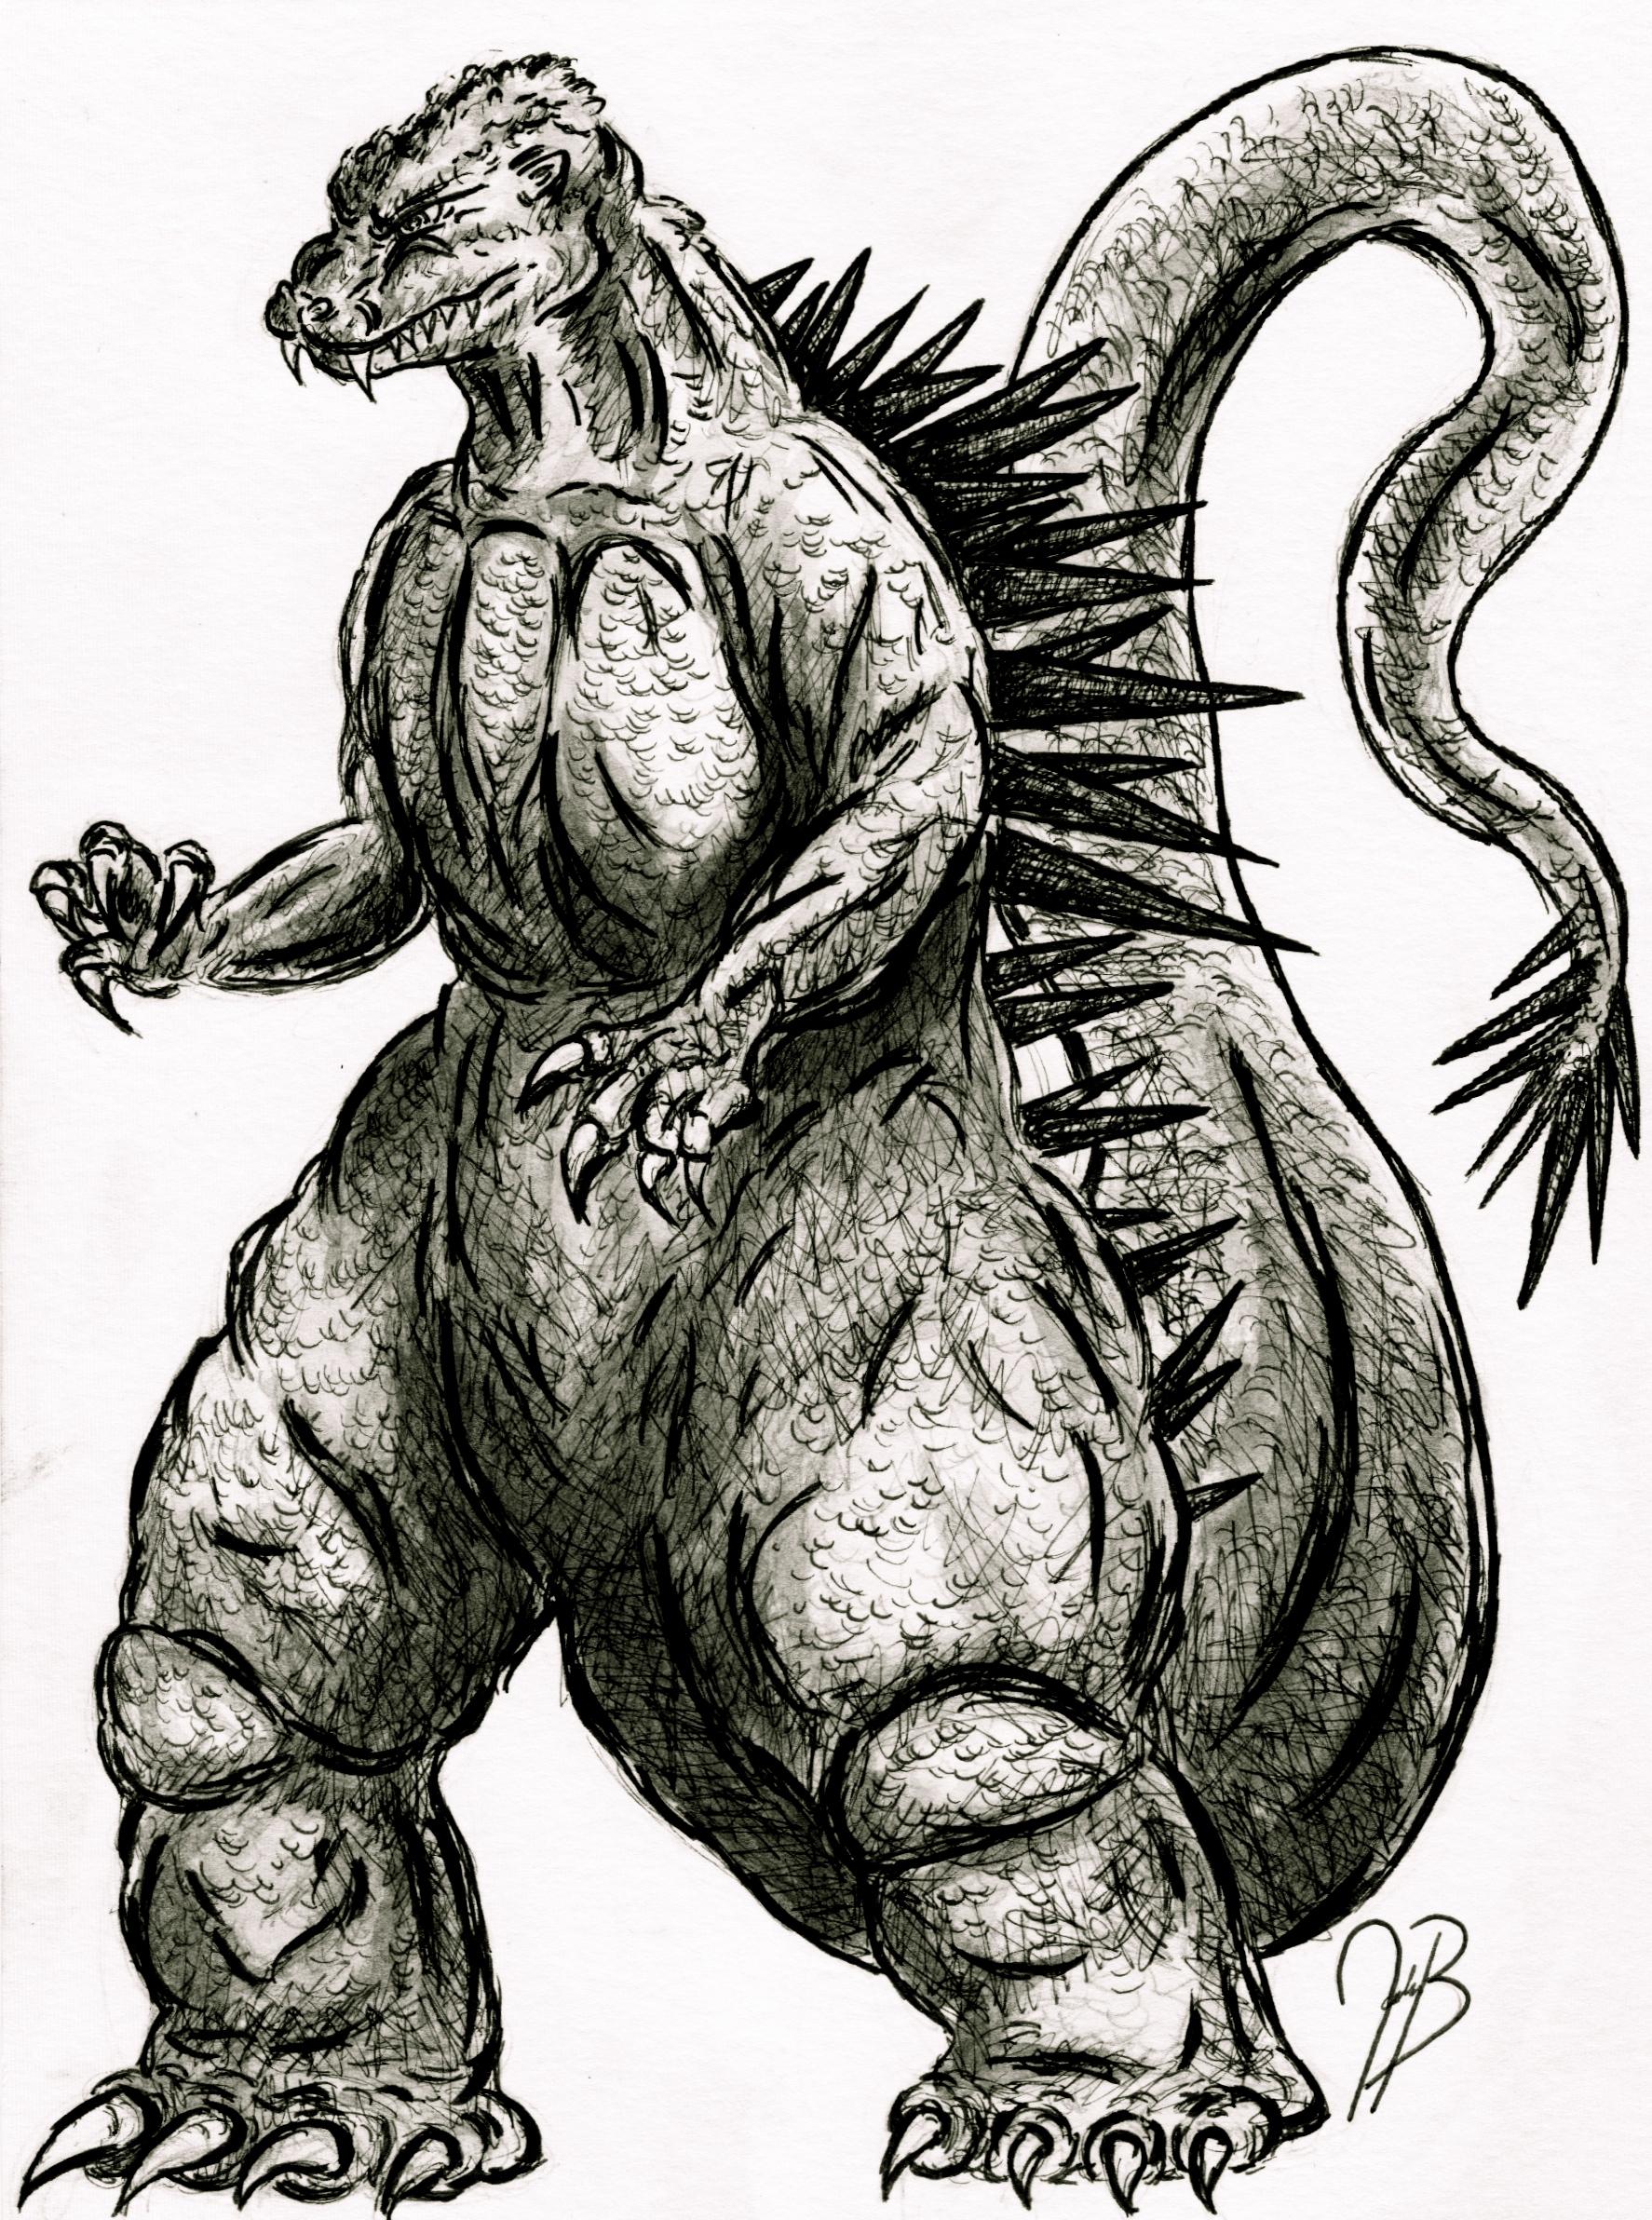 Godzilla '90s